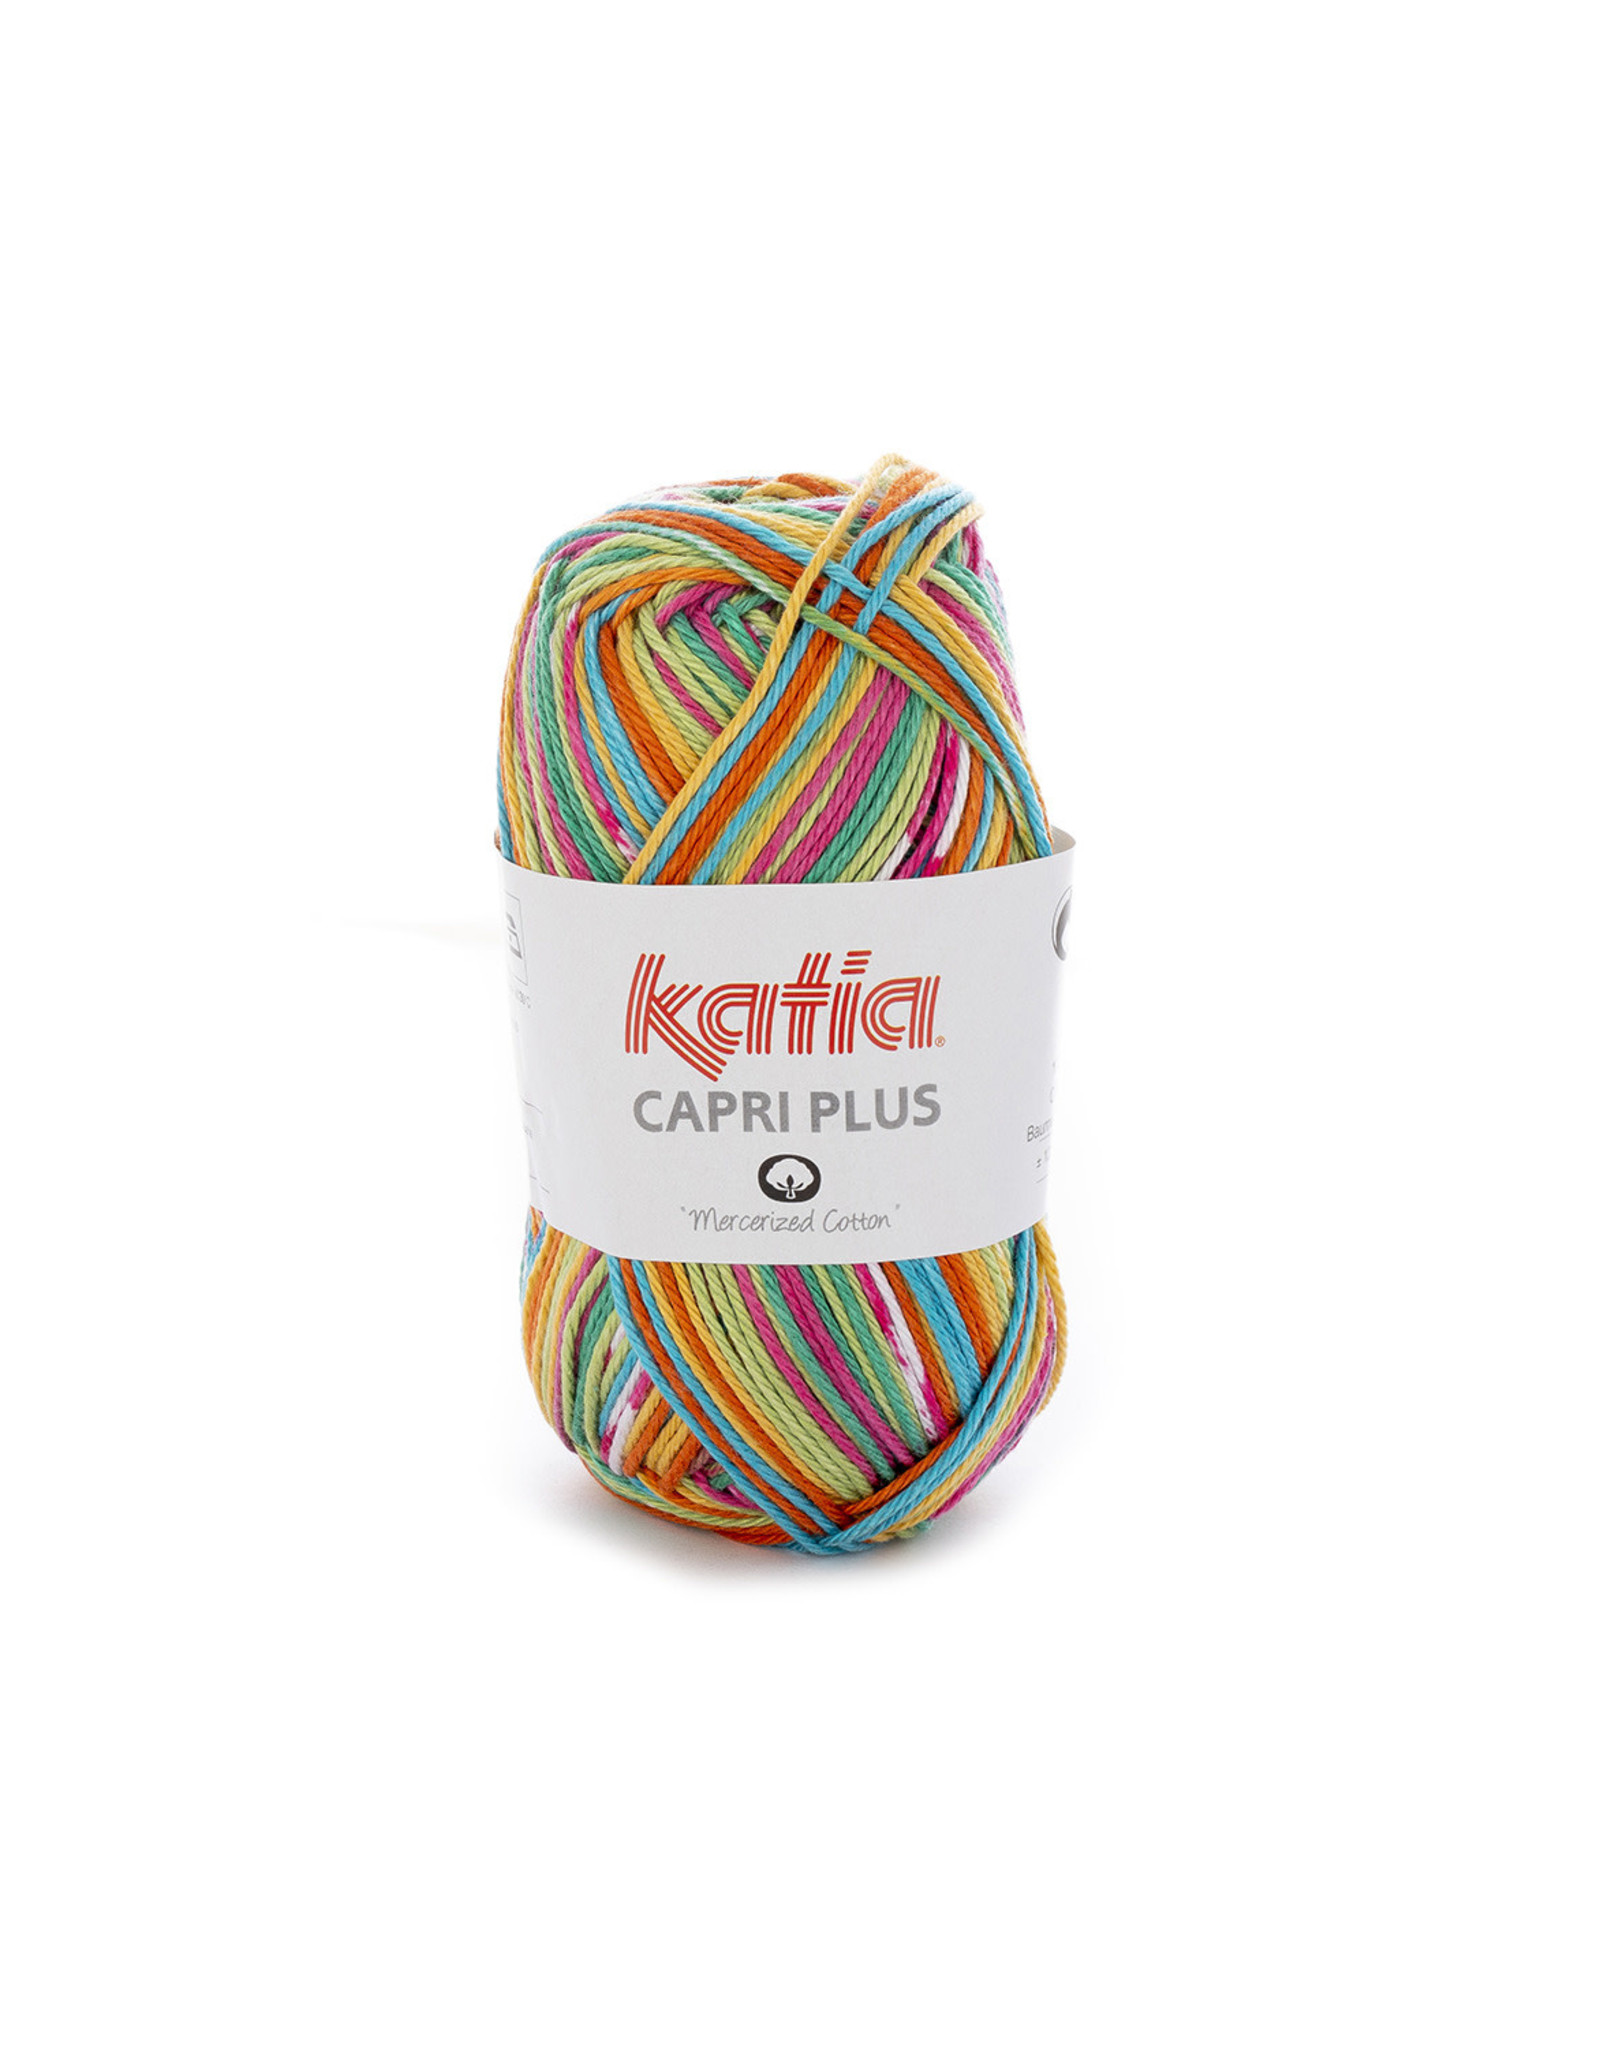 Katia Katia capri plus 104 - Pistache-Oranje-Turquoise-Fuchsia